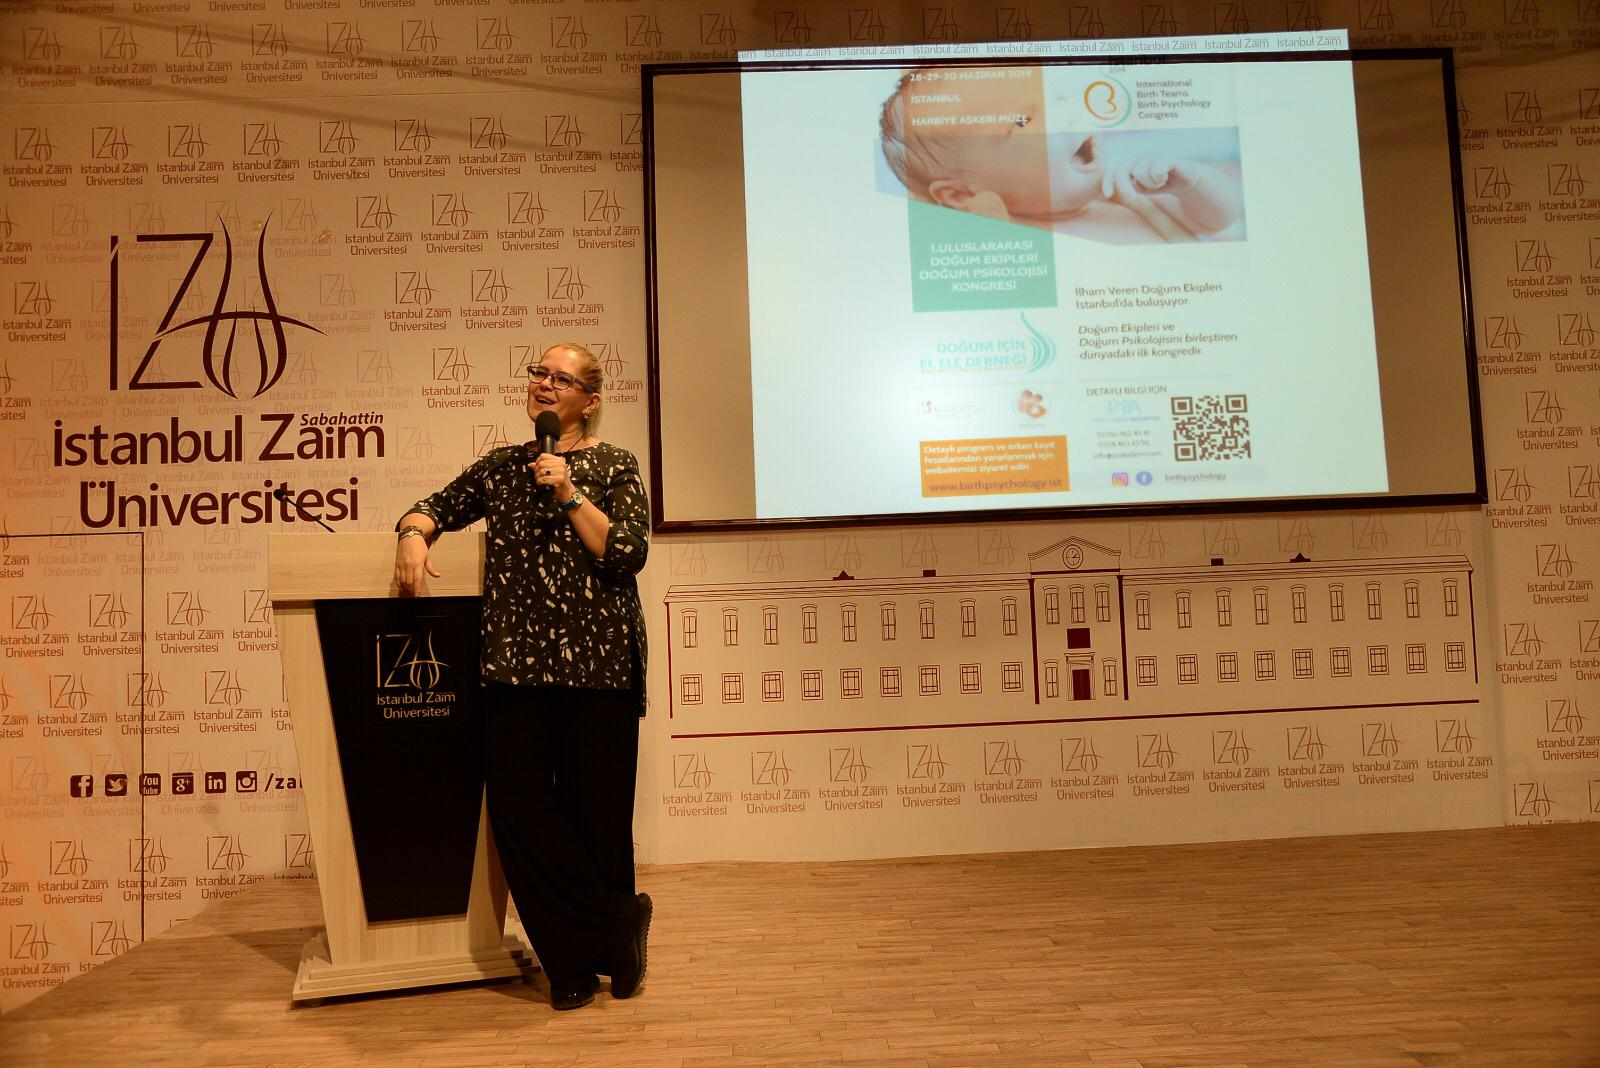 Birth Psychlology Conference at İstanbul Sabahattin Zaim University